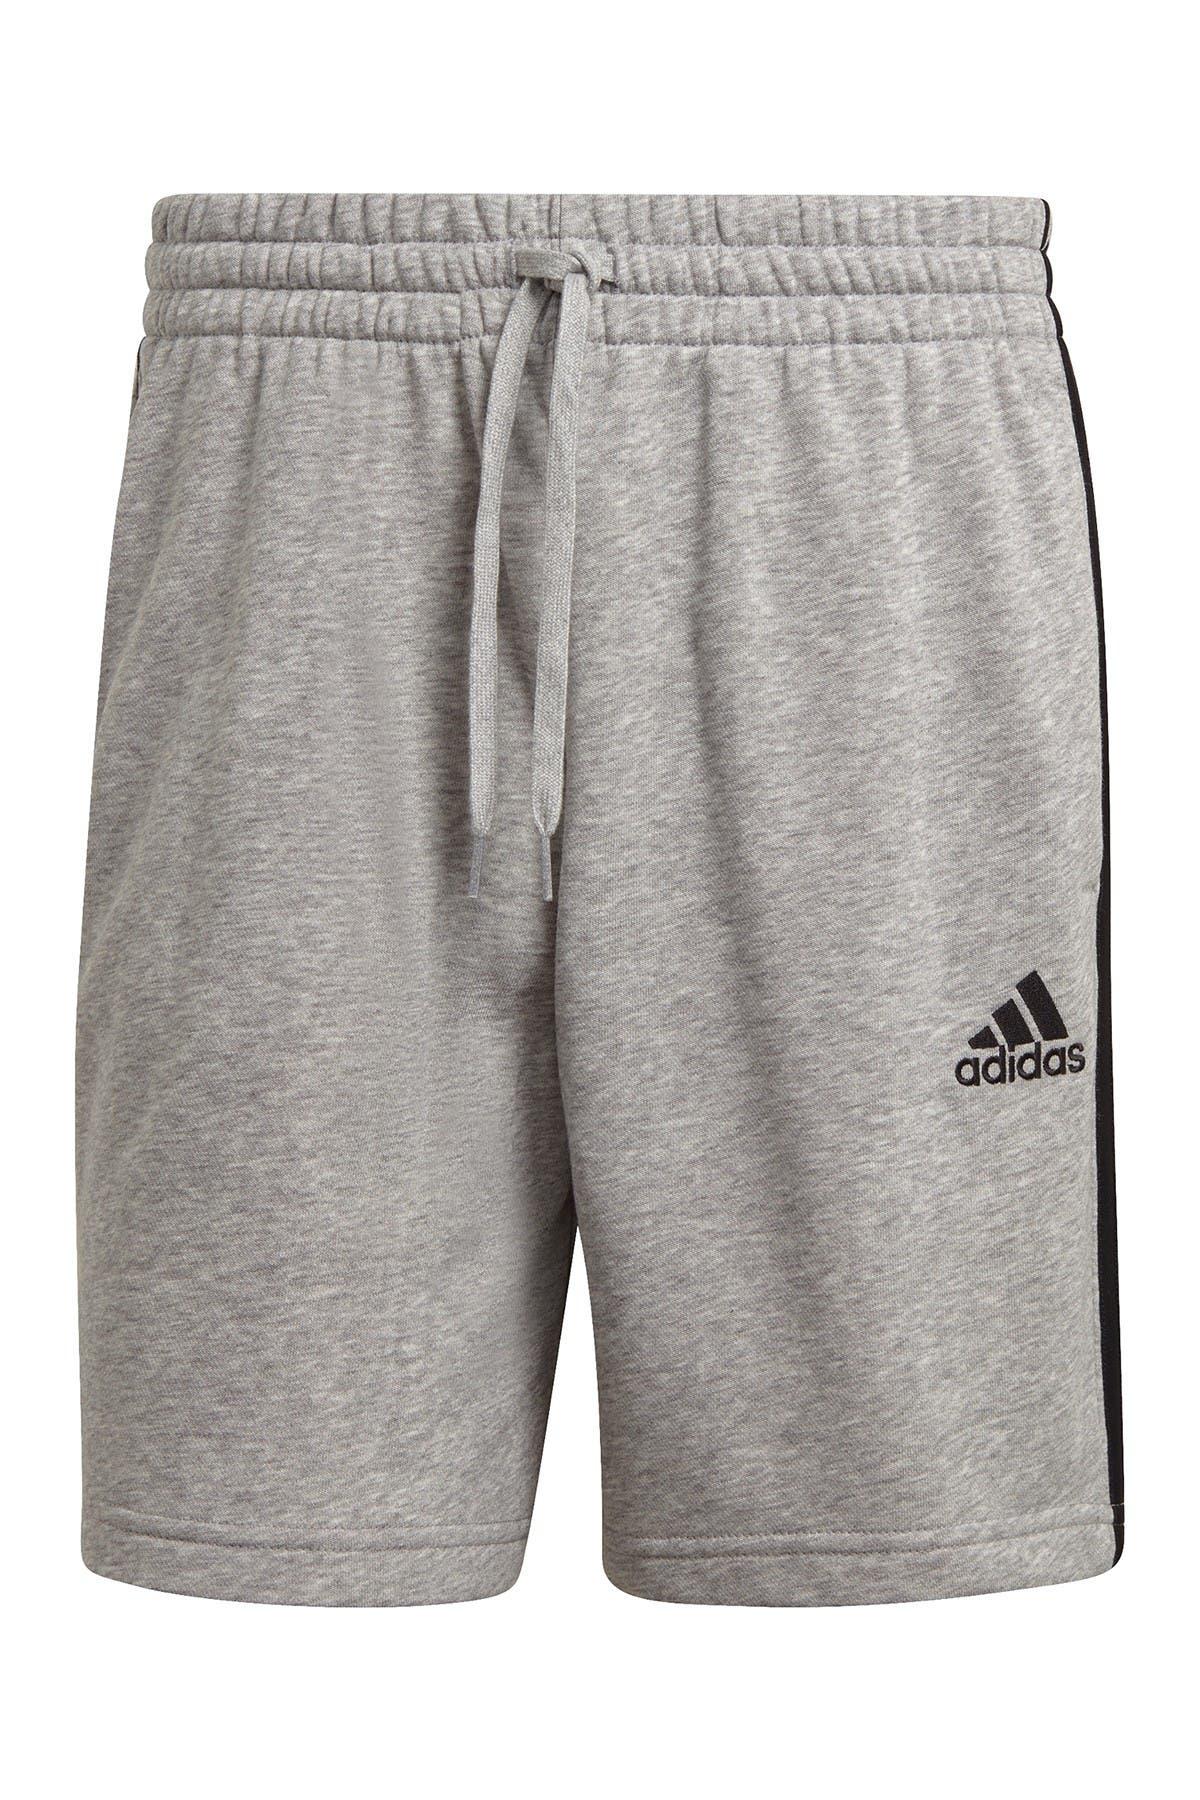 Image of adidas Essential Shorts